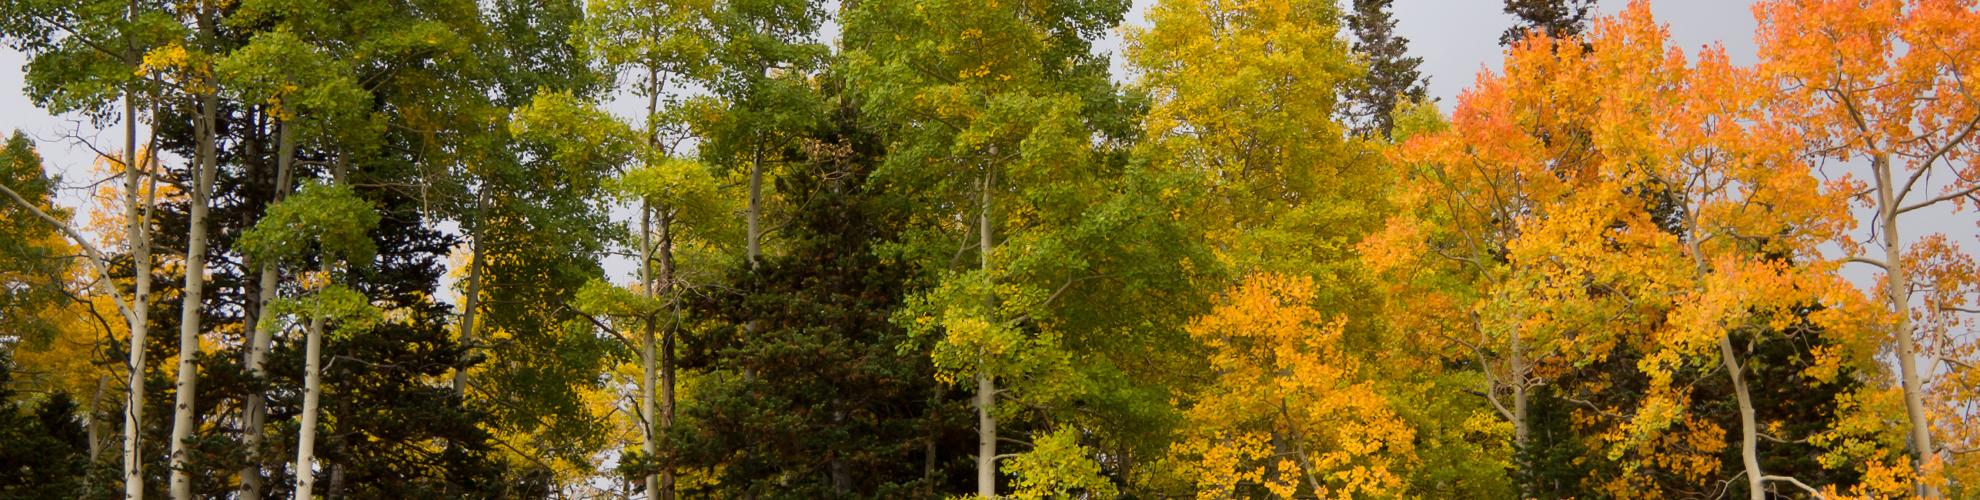 img_5892-fall-closer-leaves